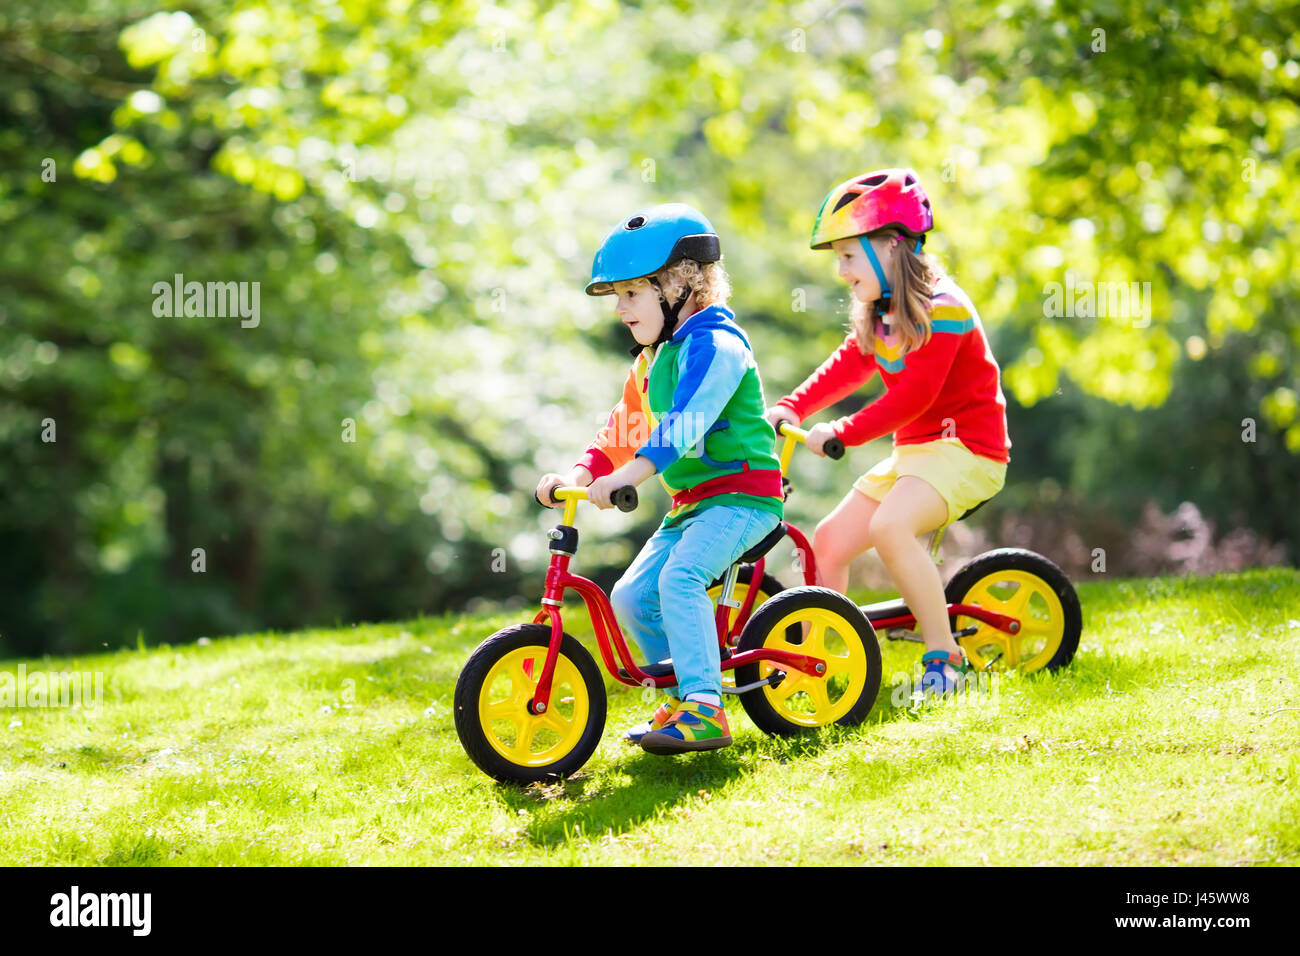 kinder laufrad fahren kinder auf dem fahrrad im sonnigen. Black Bedroom Furniture Sets. Home Design Ideas